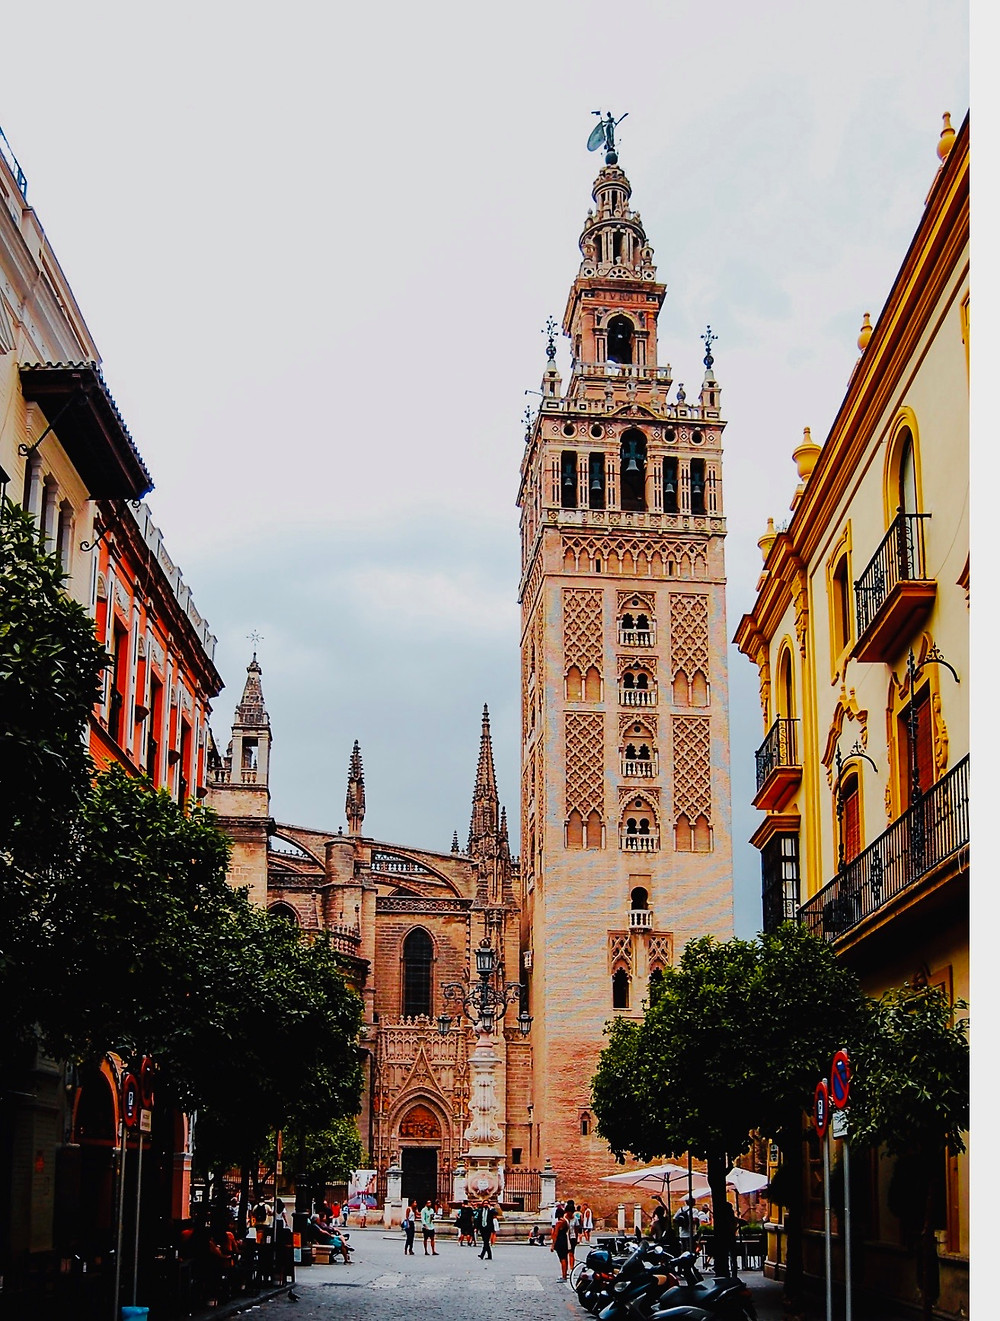 La Giralda bell tower, the symbol of Seville